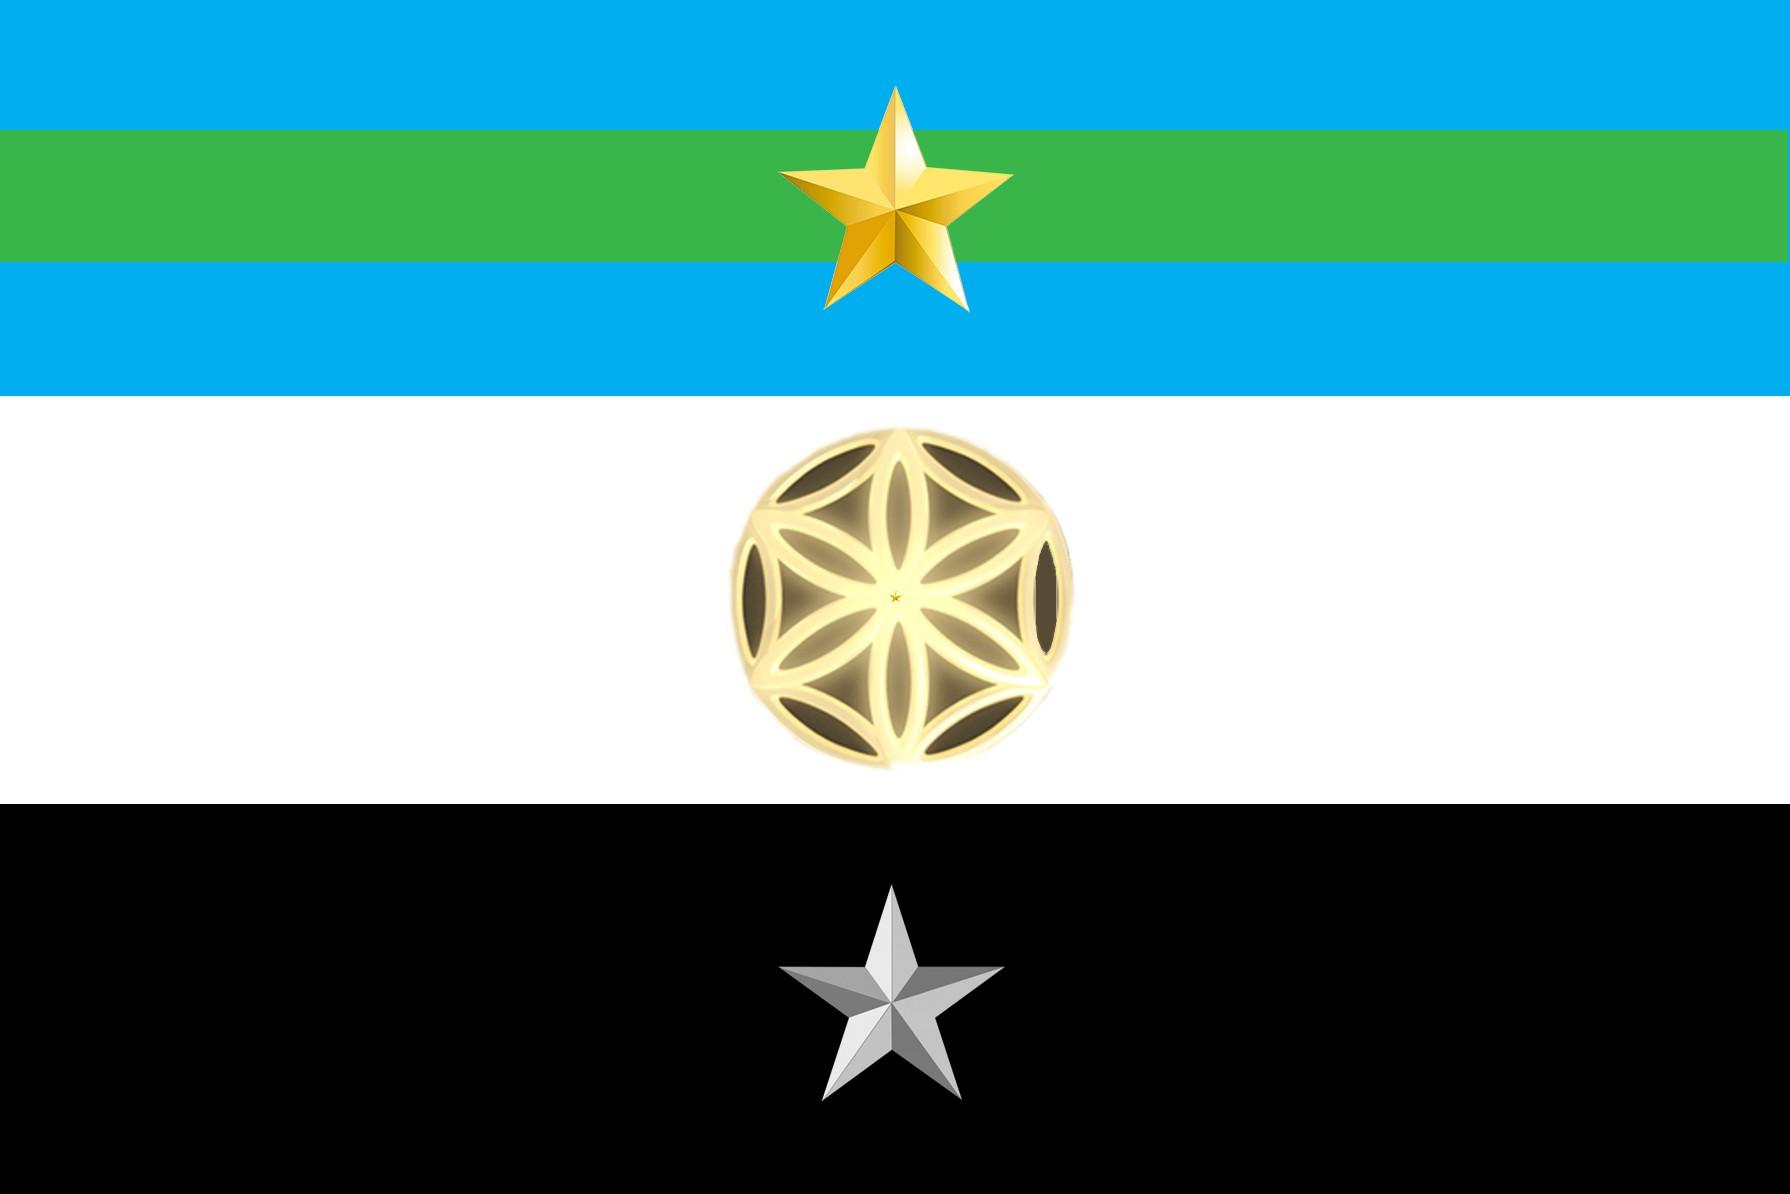 Portfolio des emblèmes de la nation Asgardia